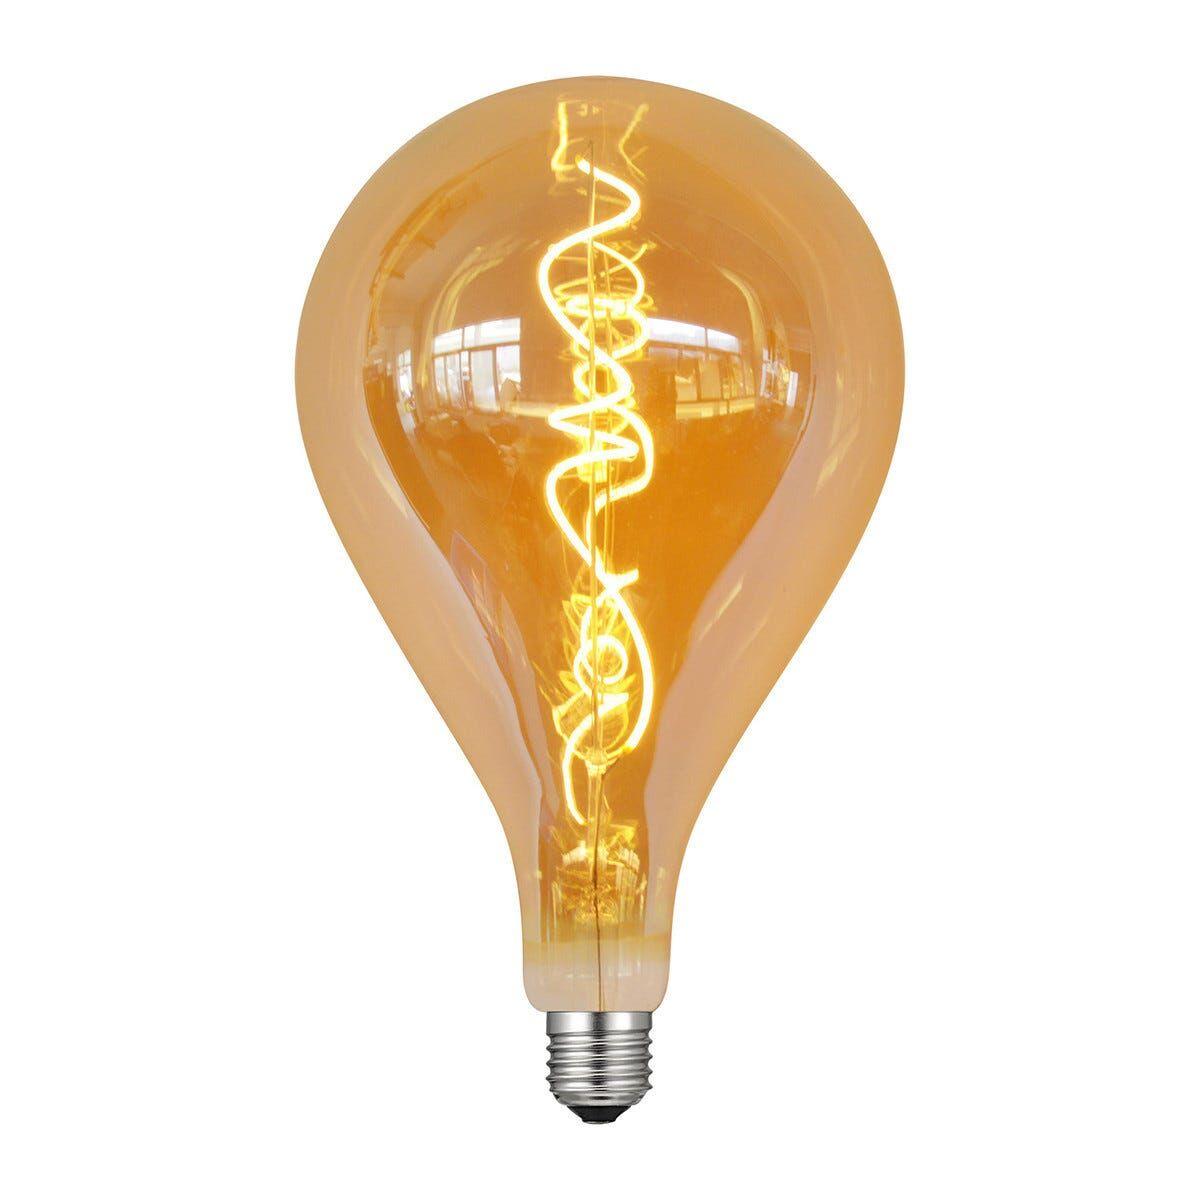 vivida international lampadina vivida led vintage decanter e27 5w=26w 270 lumen 2700k luce calda Ø180x240mm